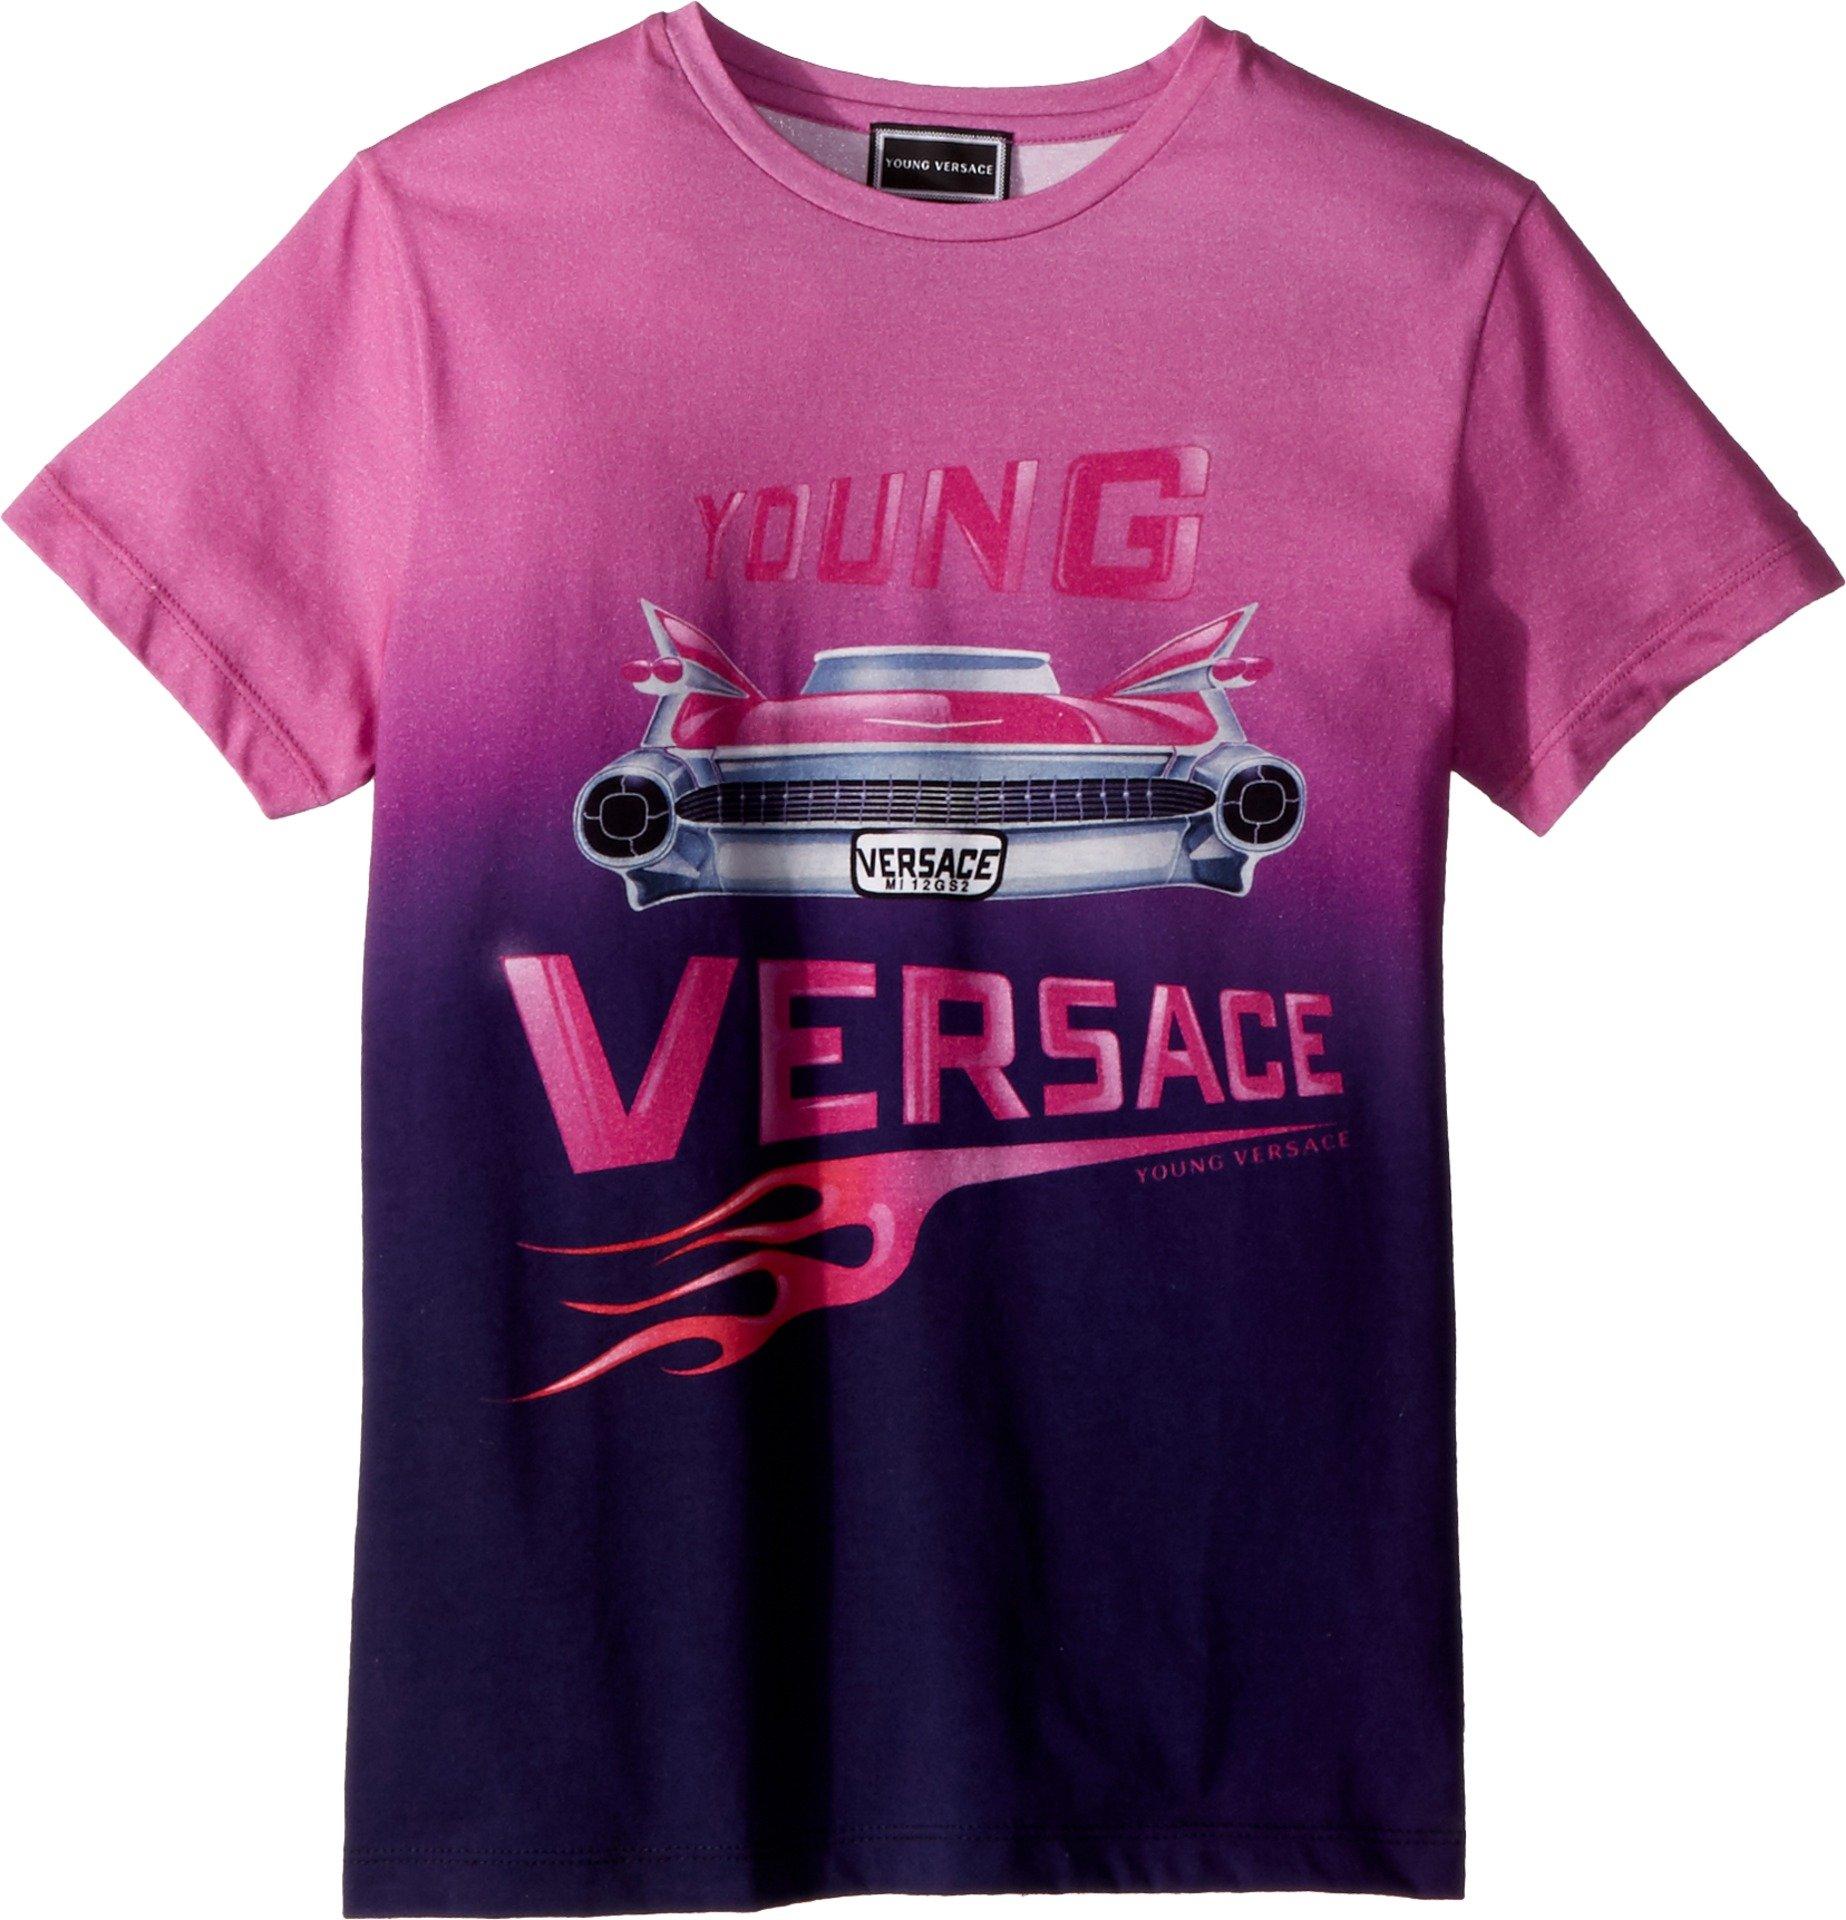 Versace Kids Girl's Short Sleeve Logo Car Graphic T-Shirt (Big Kids) Pink/Multi 11-12